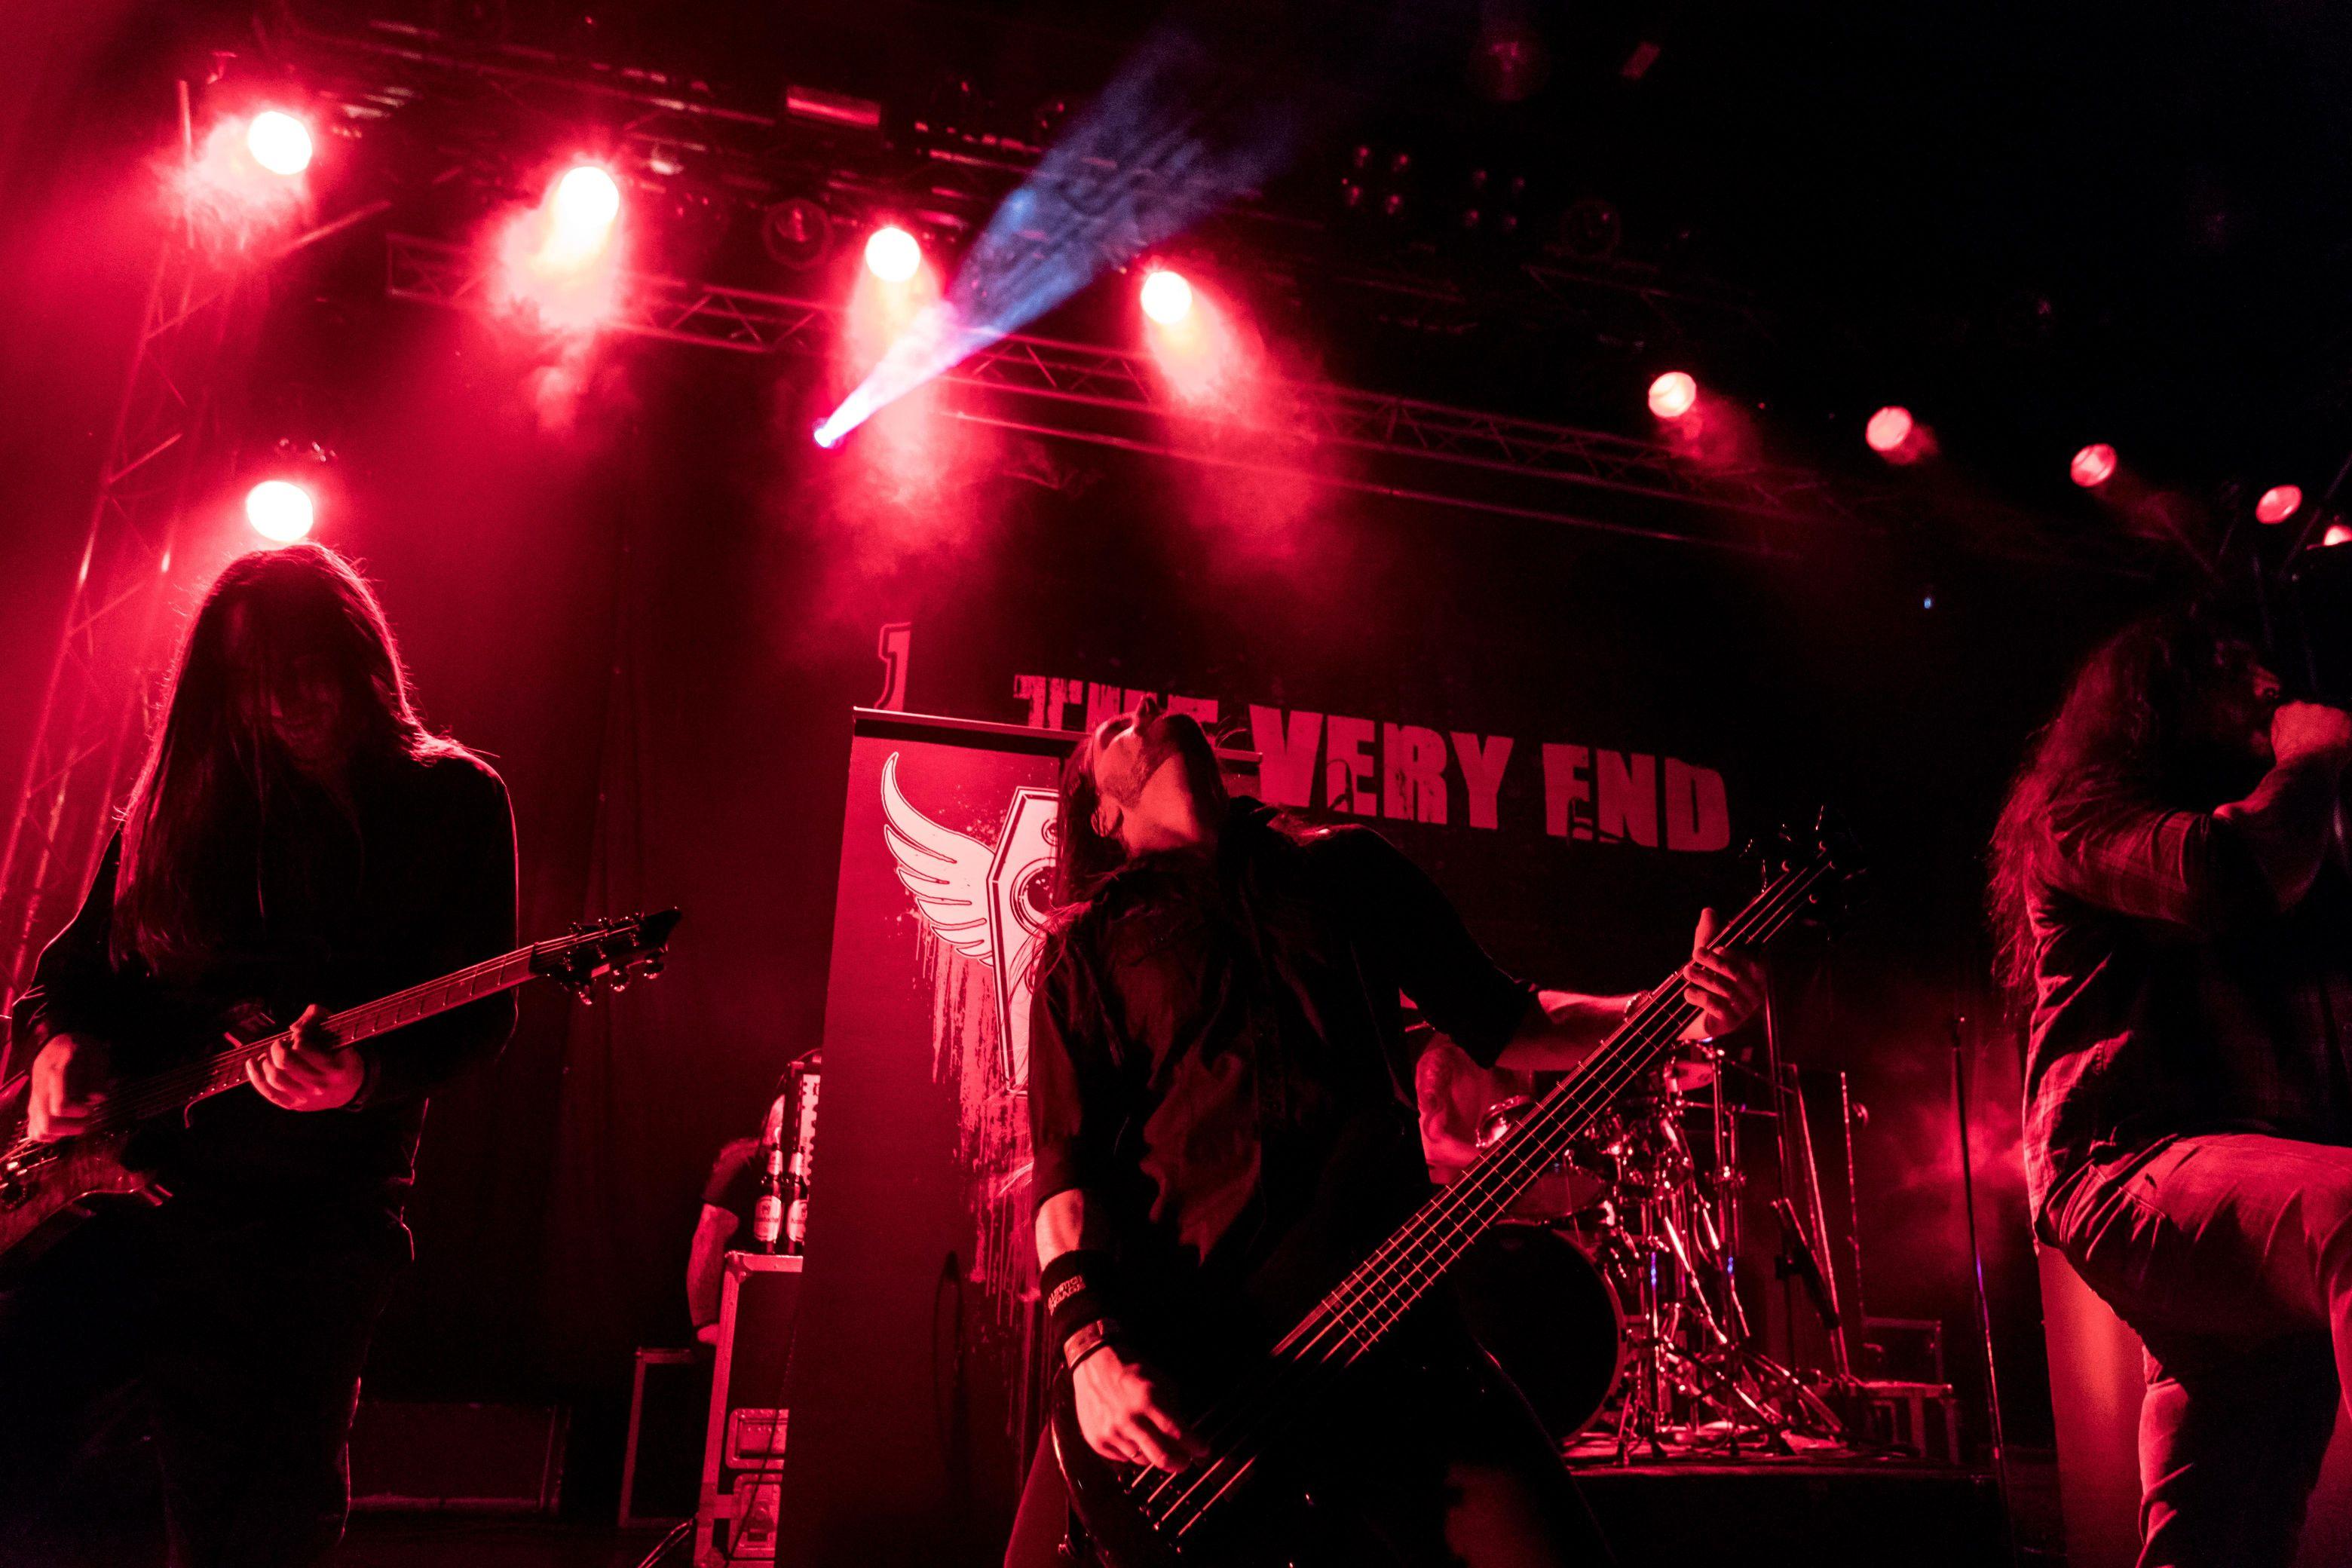 the-very-end-live-zeche-carl-essen-germany-thrash-metal_6